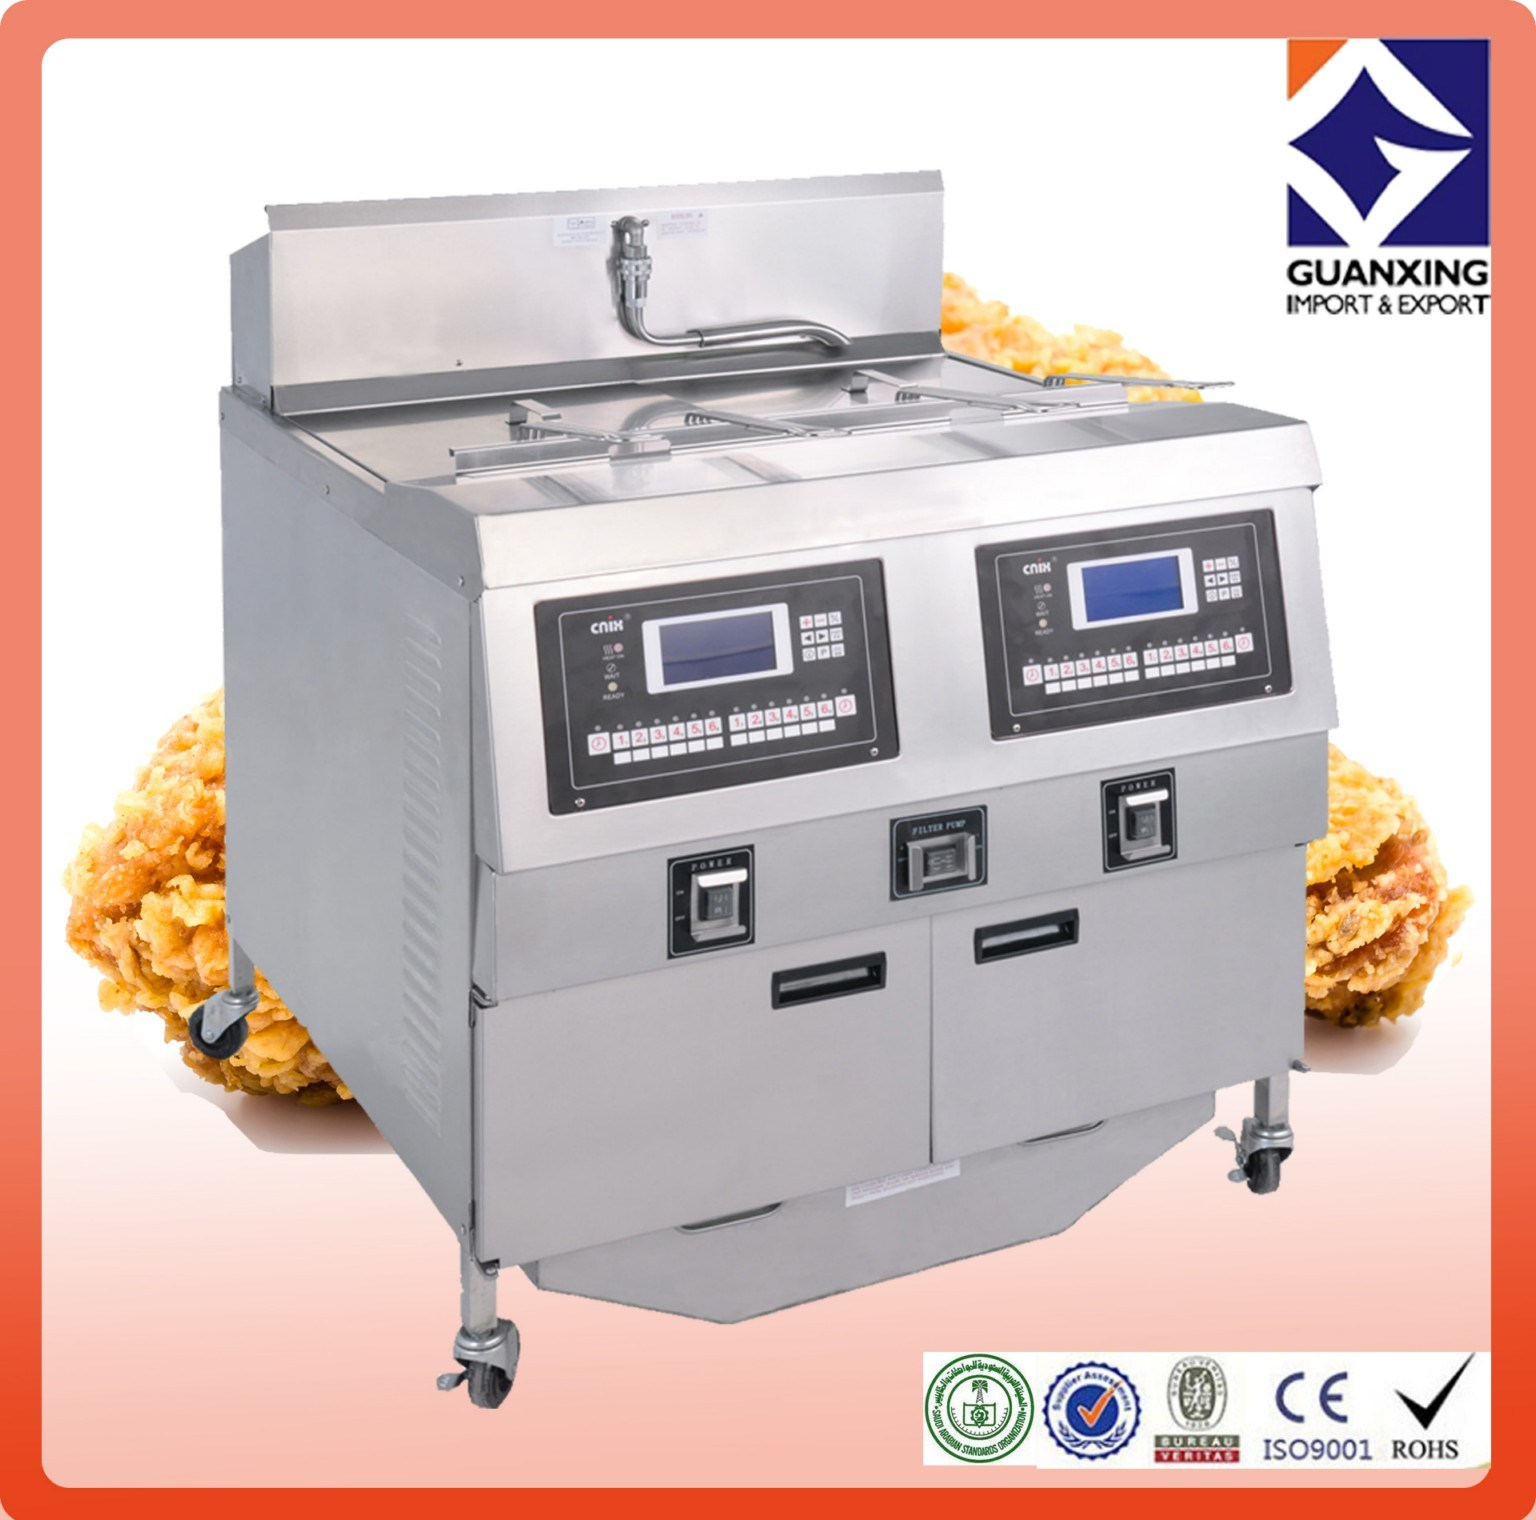 Temperature-Controlled Fryer/Open Fryer/Fast Food Equipment/Electric Open Fryer